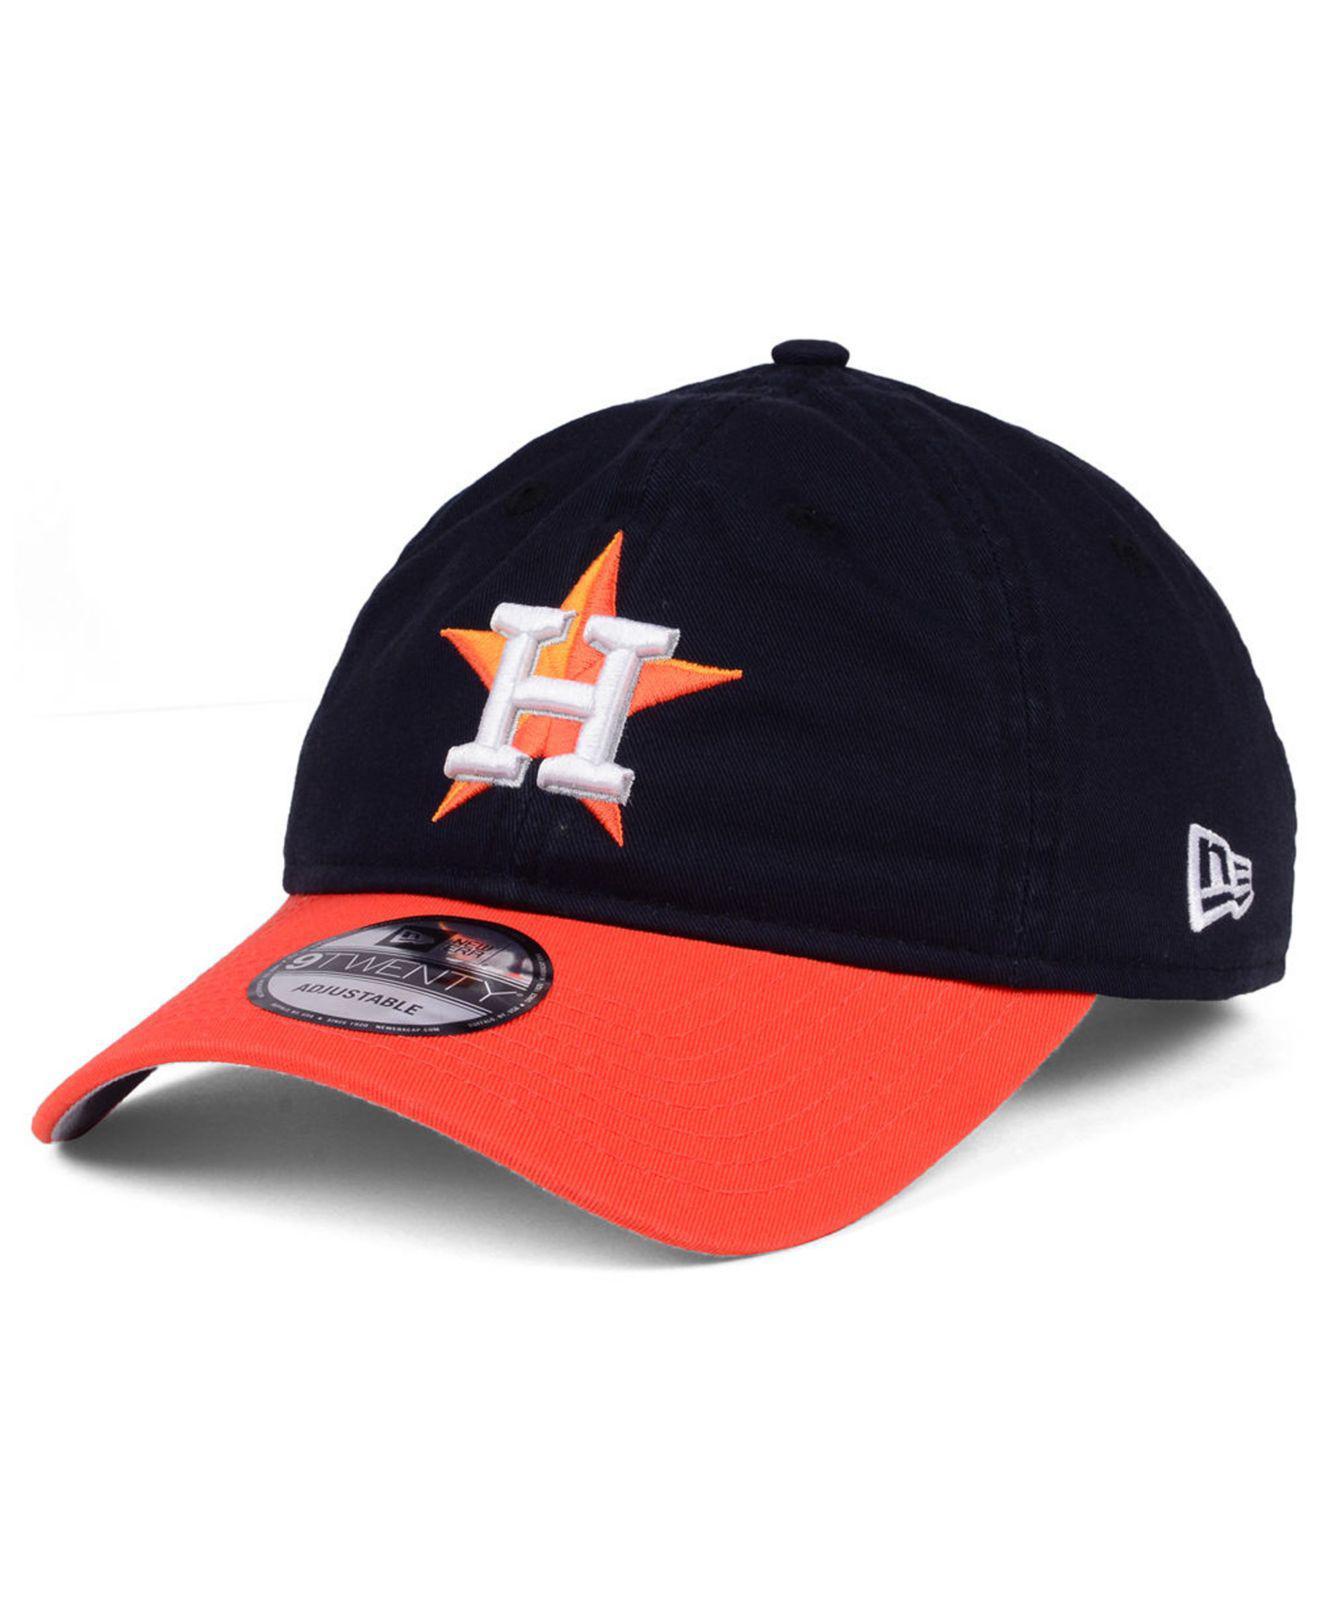 new styles b81ed eb497 KTZ. Men s Blue Houston Astros On-field Replica 9twenty Cap